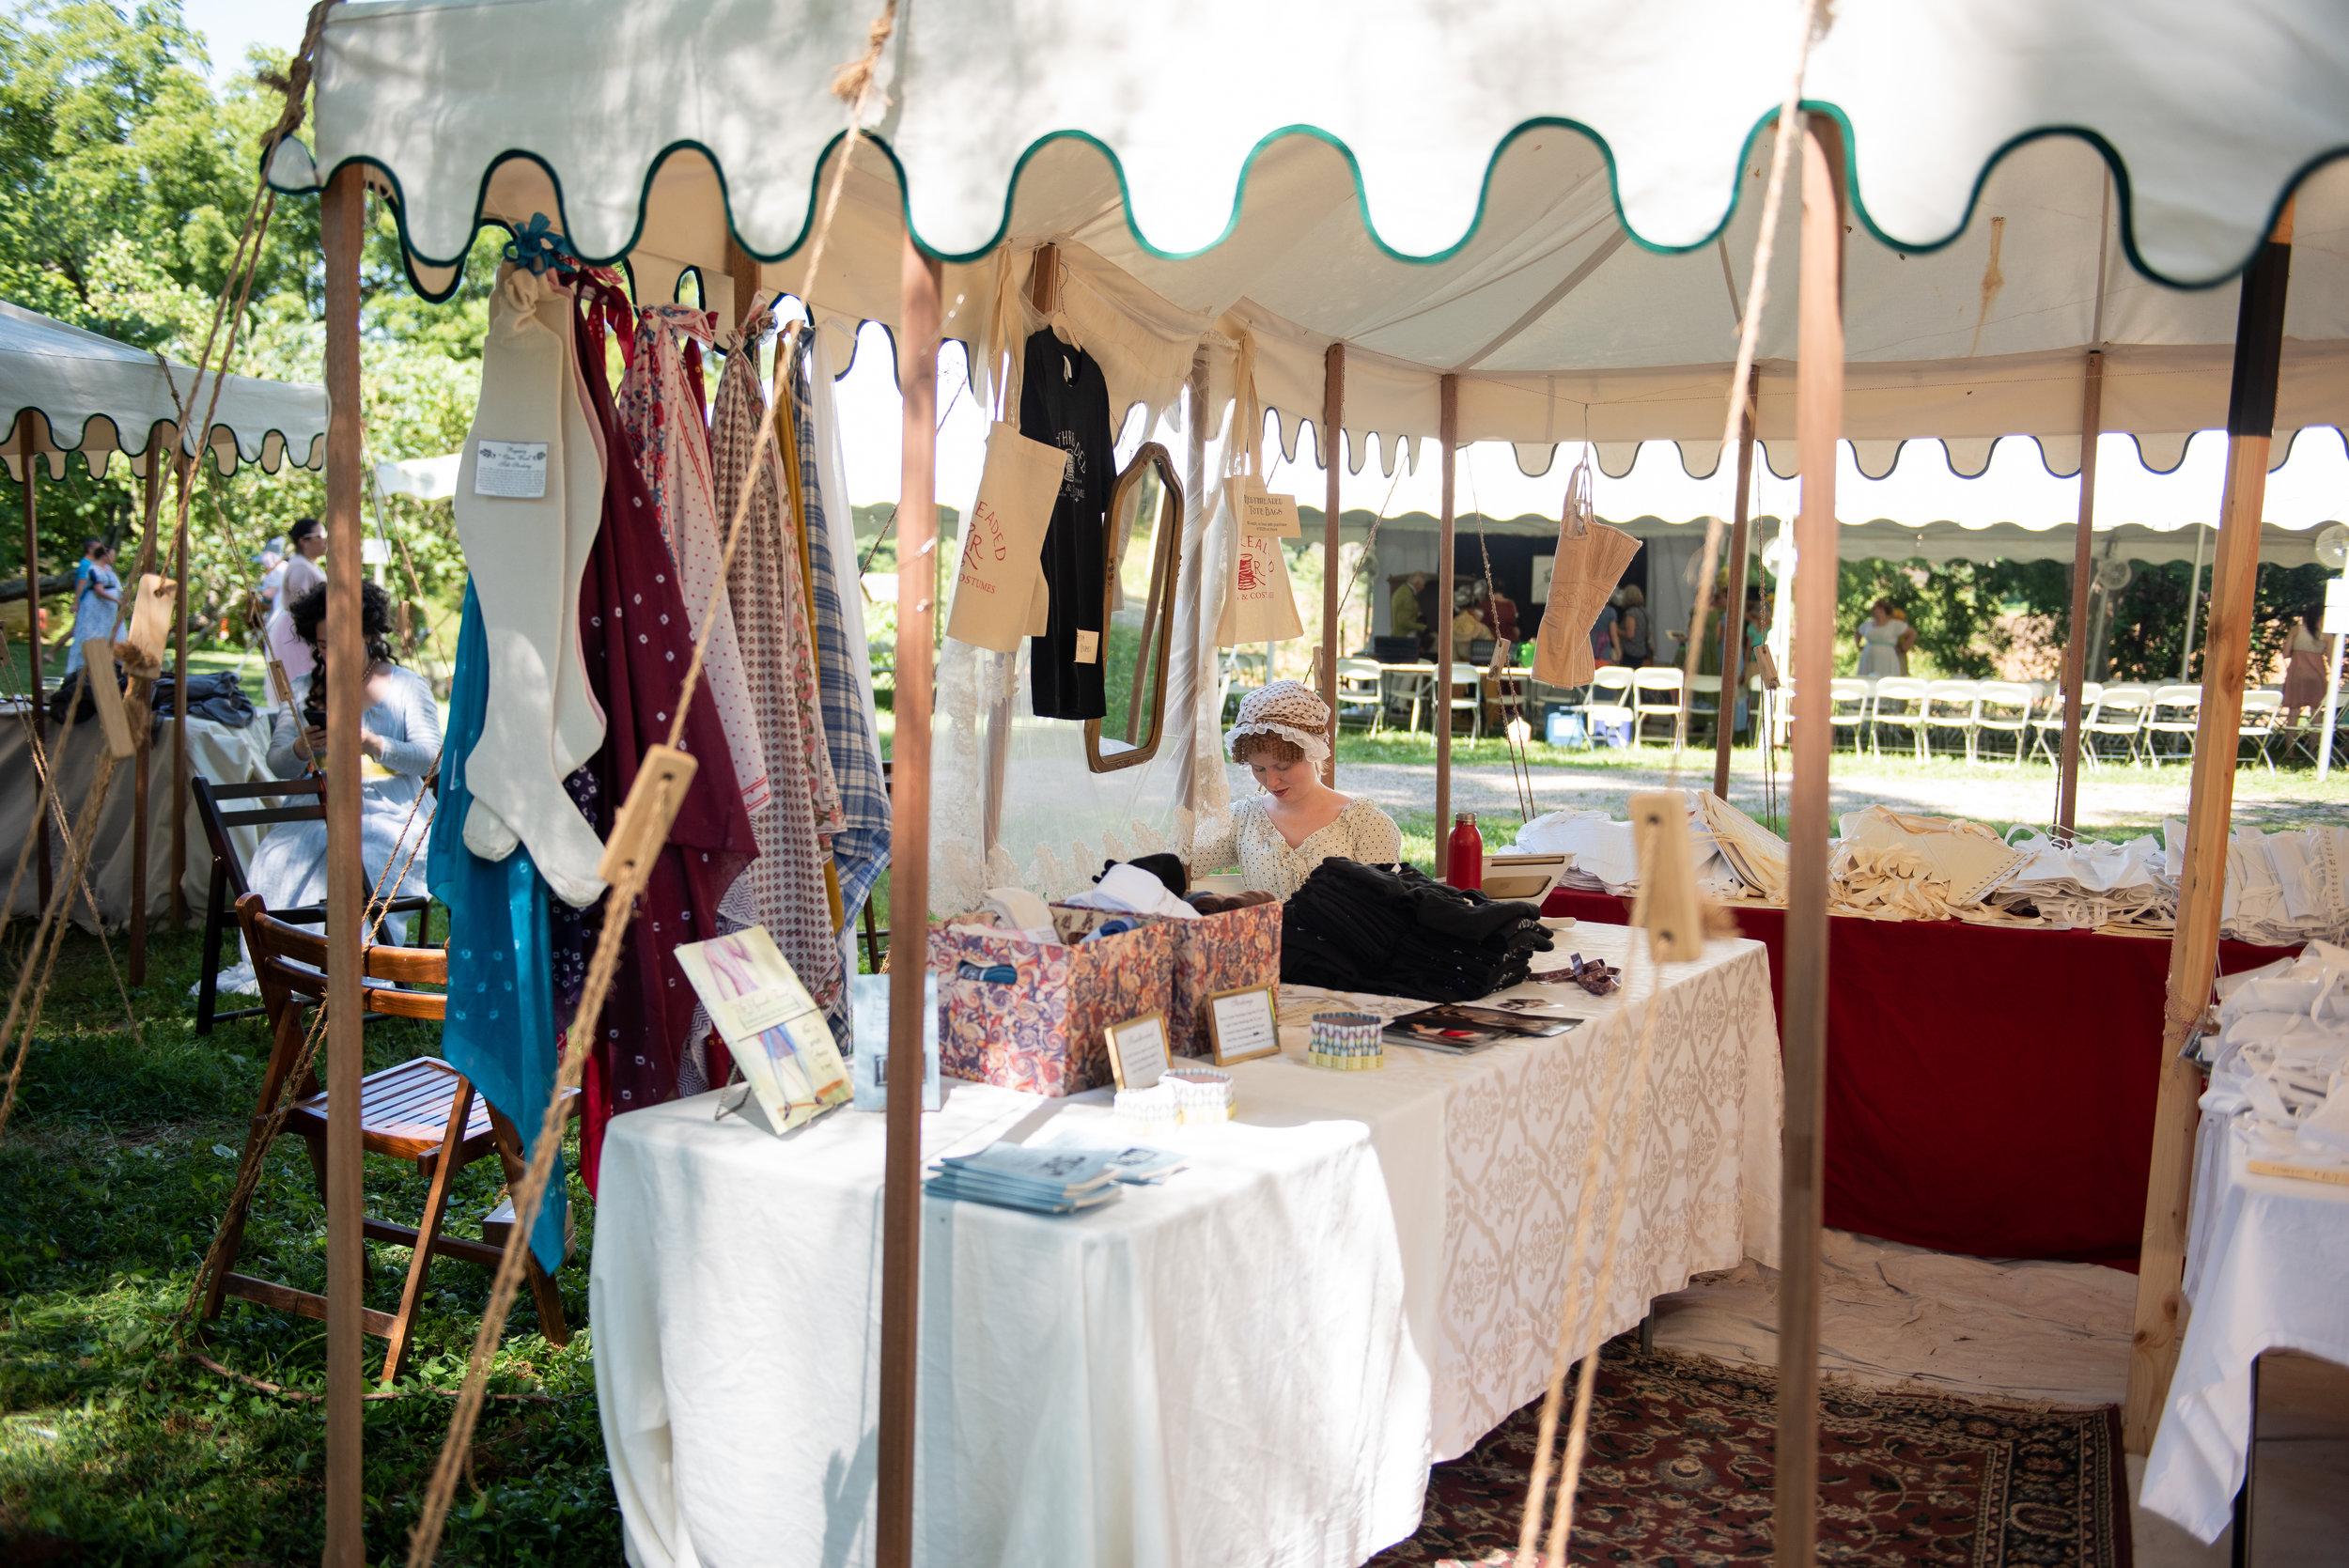 Jane Austen Festival Louisville Kentucky 2019 Redthreaded corset